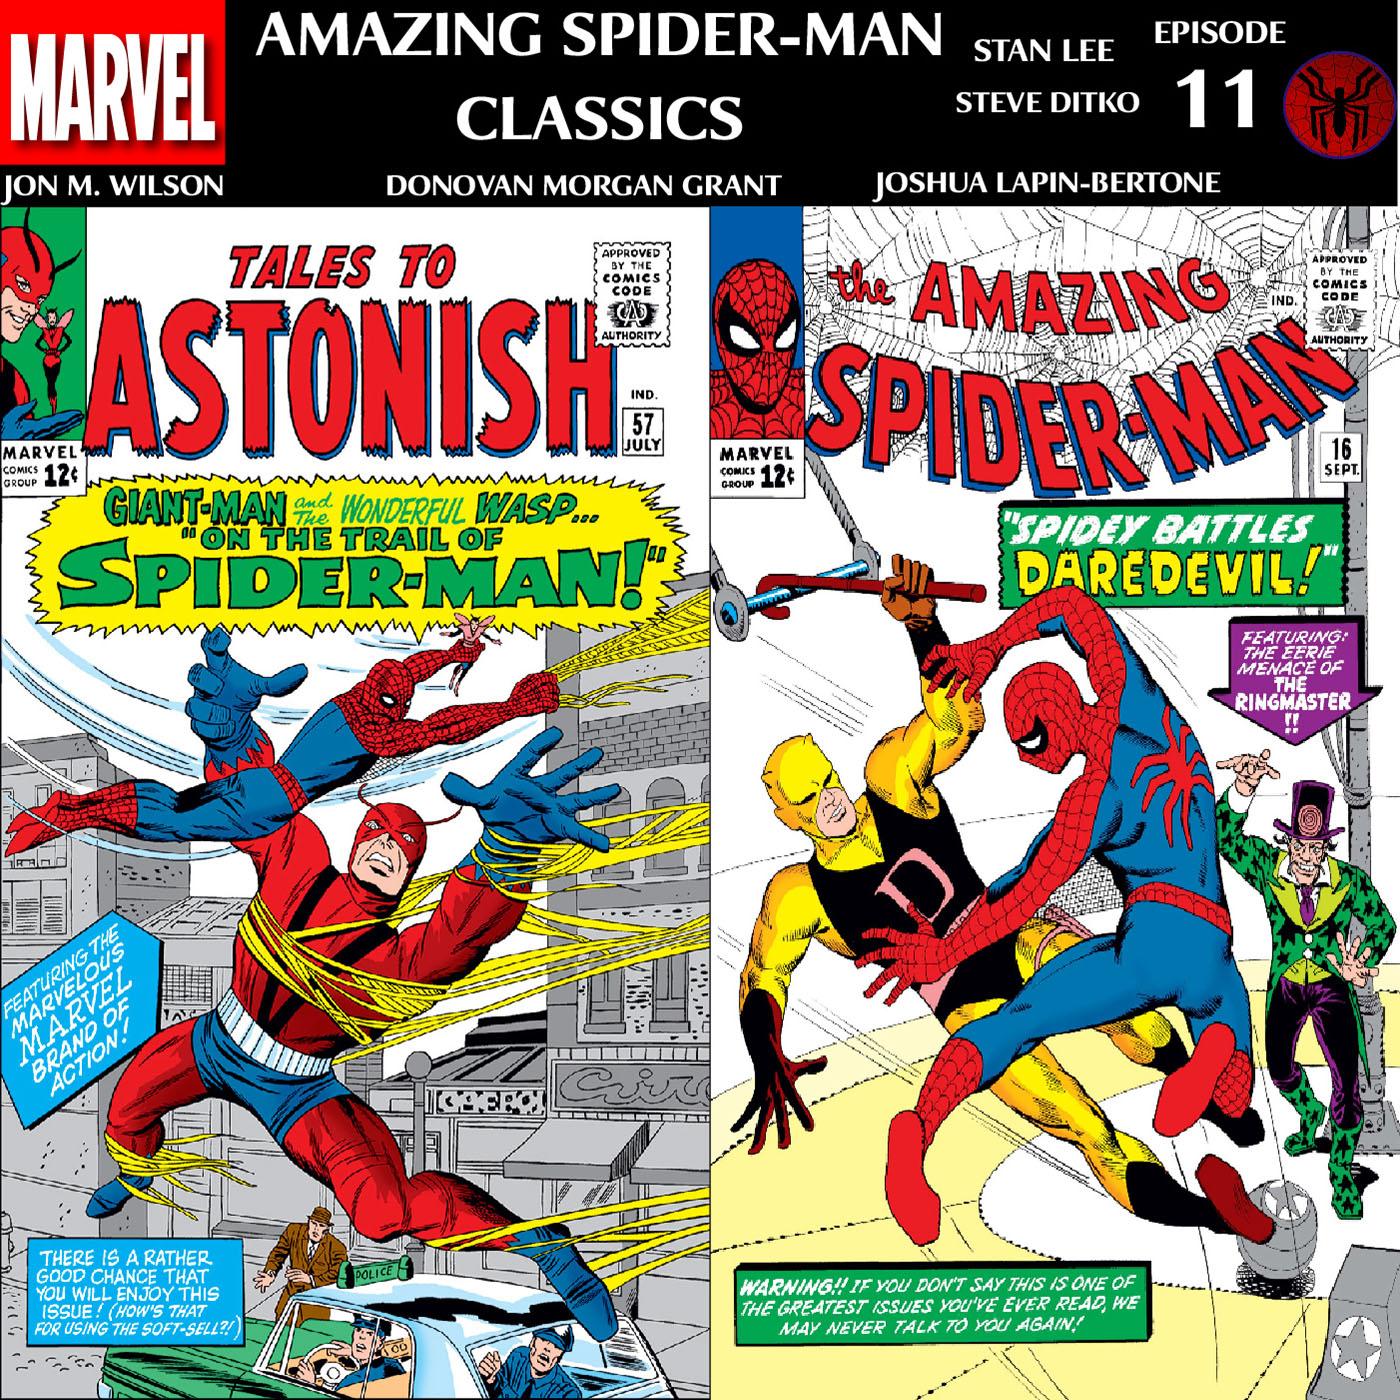 ASM Classics Episode 11: ASM 16 & Tales to Astonish 57